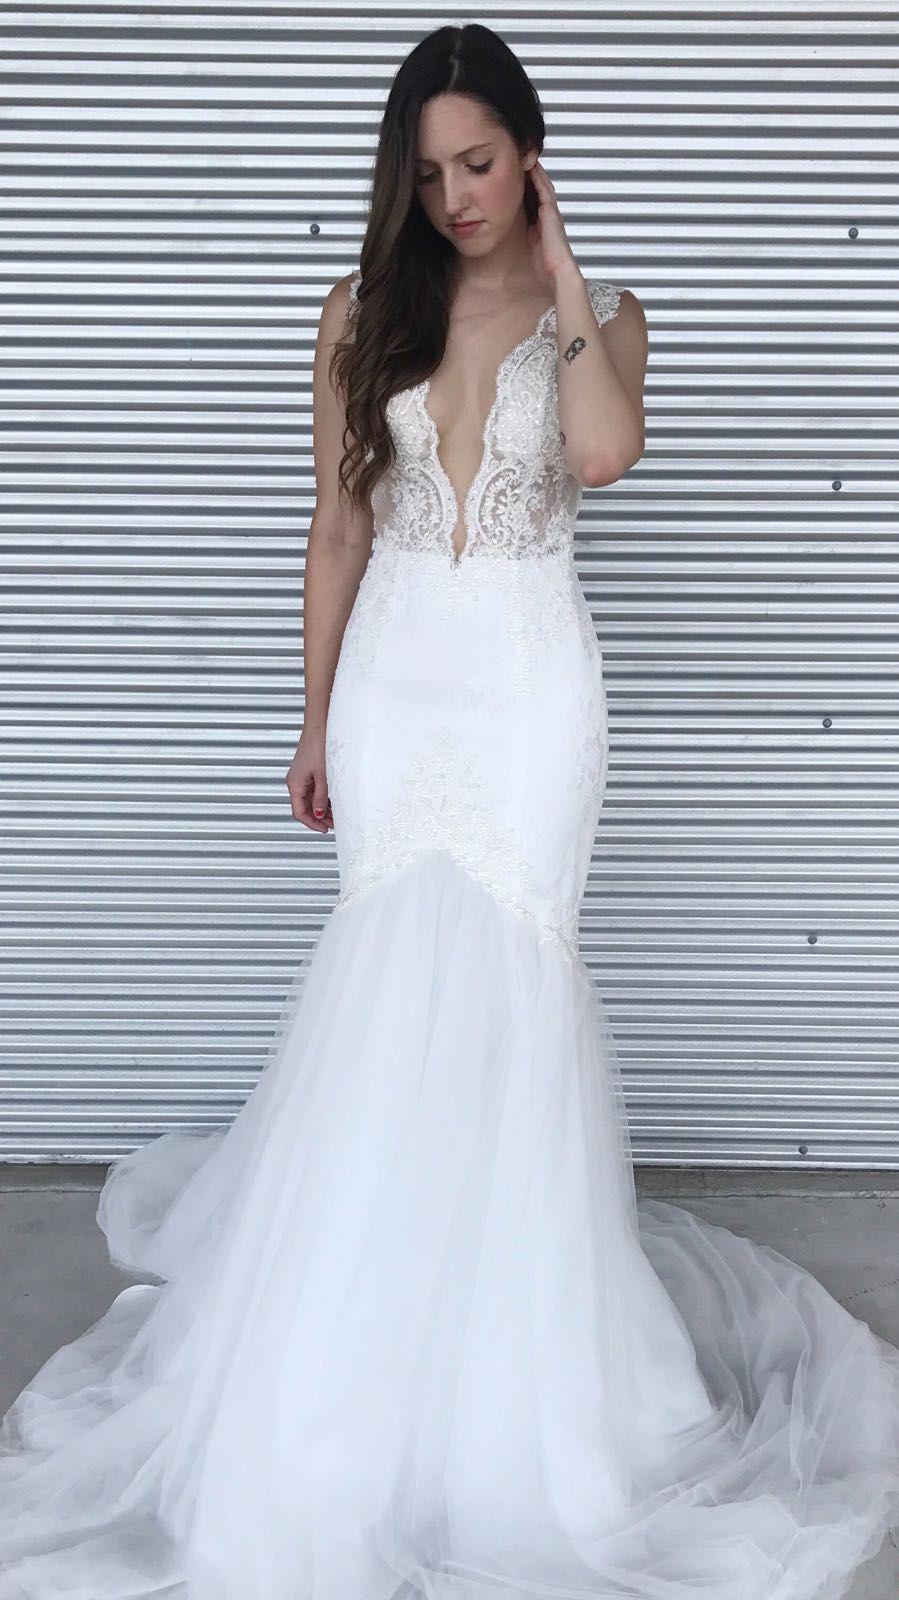 Unique Plunging Neckline Wedding Dress. 2018 Top Wedding Dresses ...